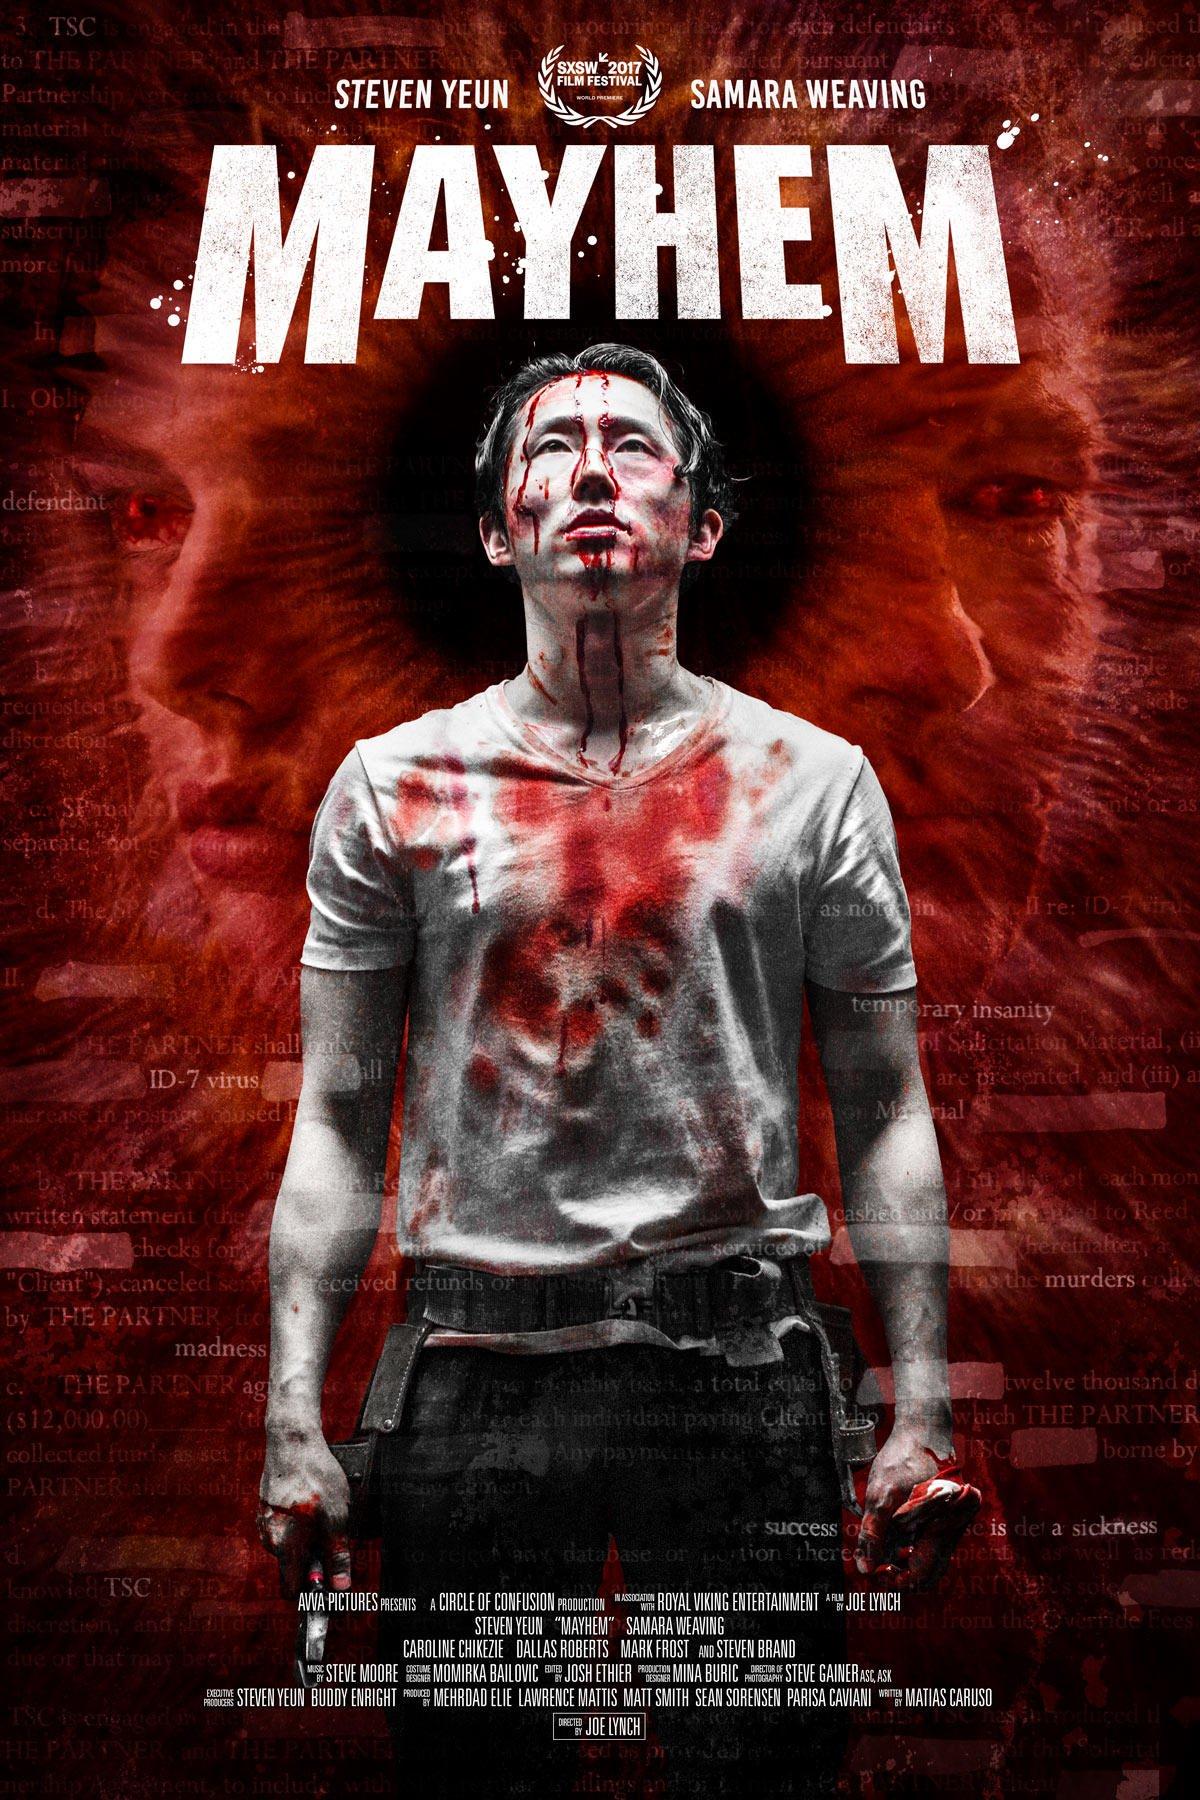 Mayhem-poster-02.jpg